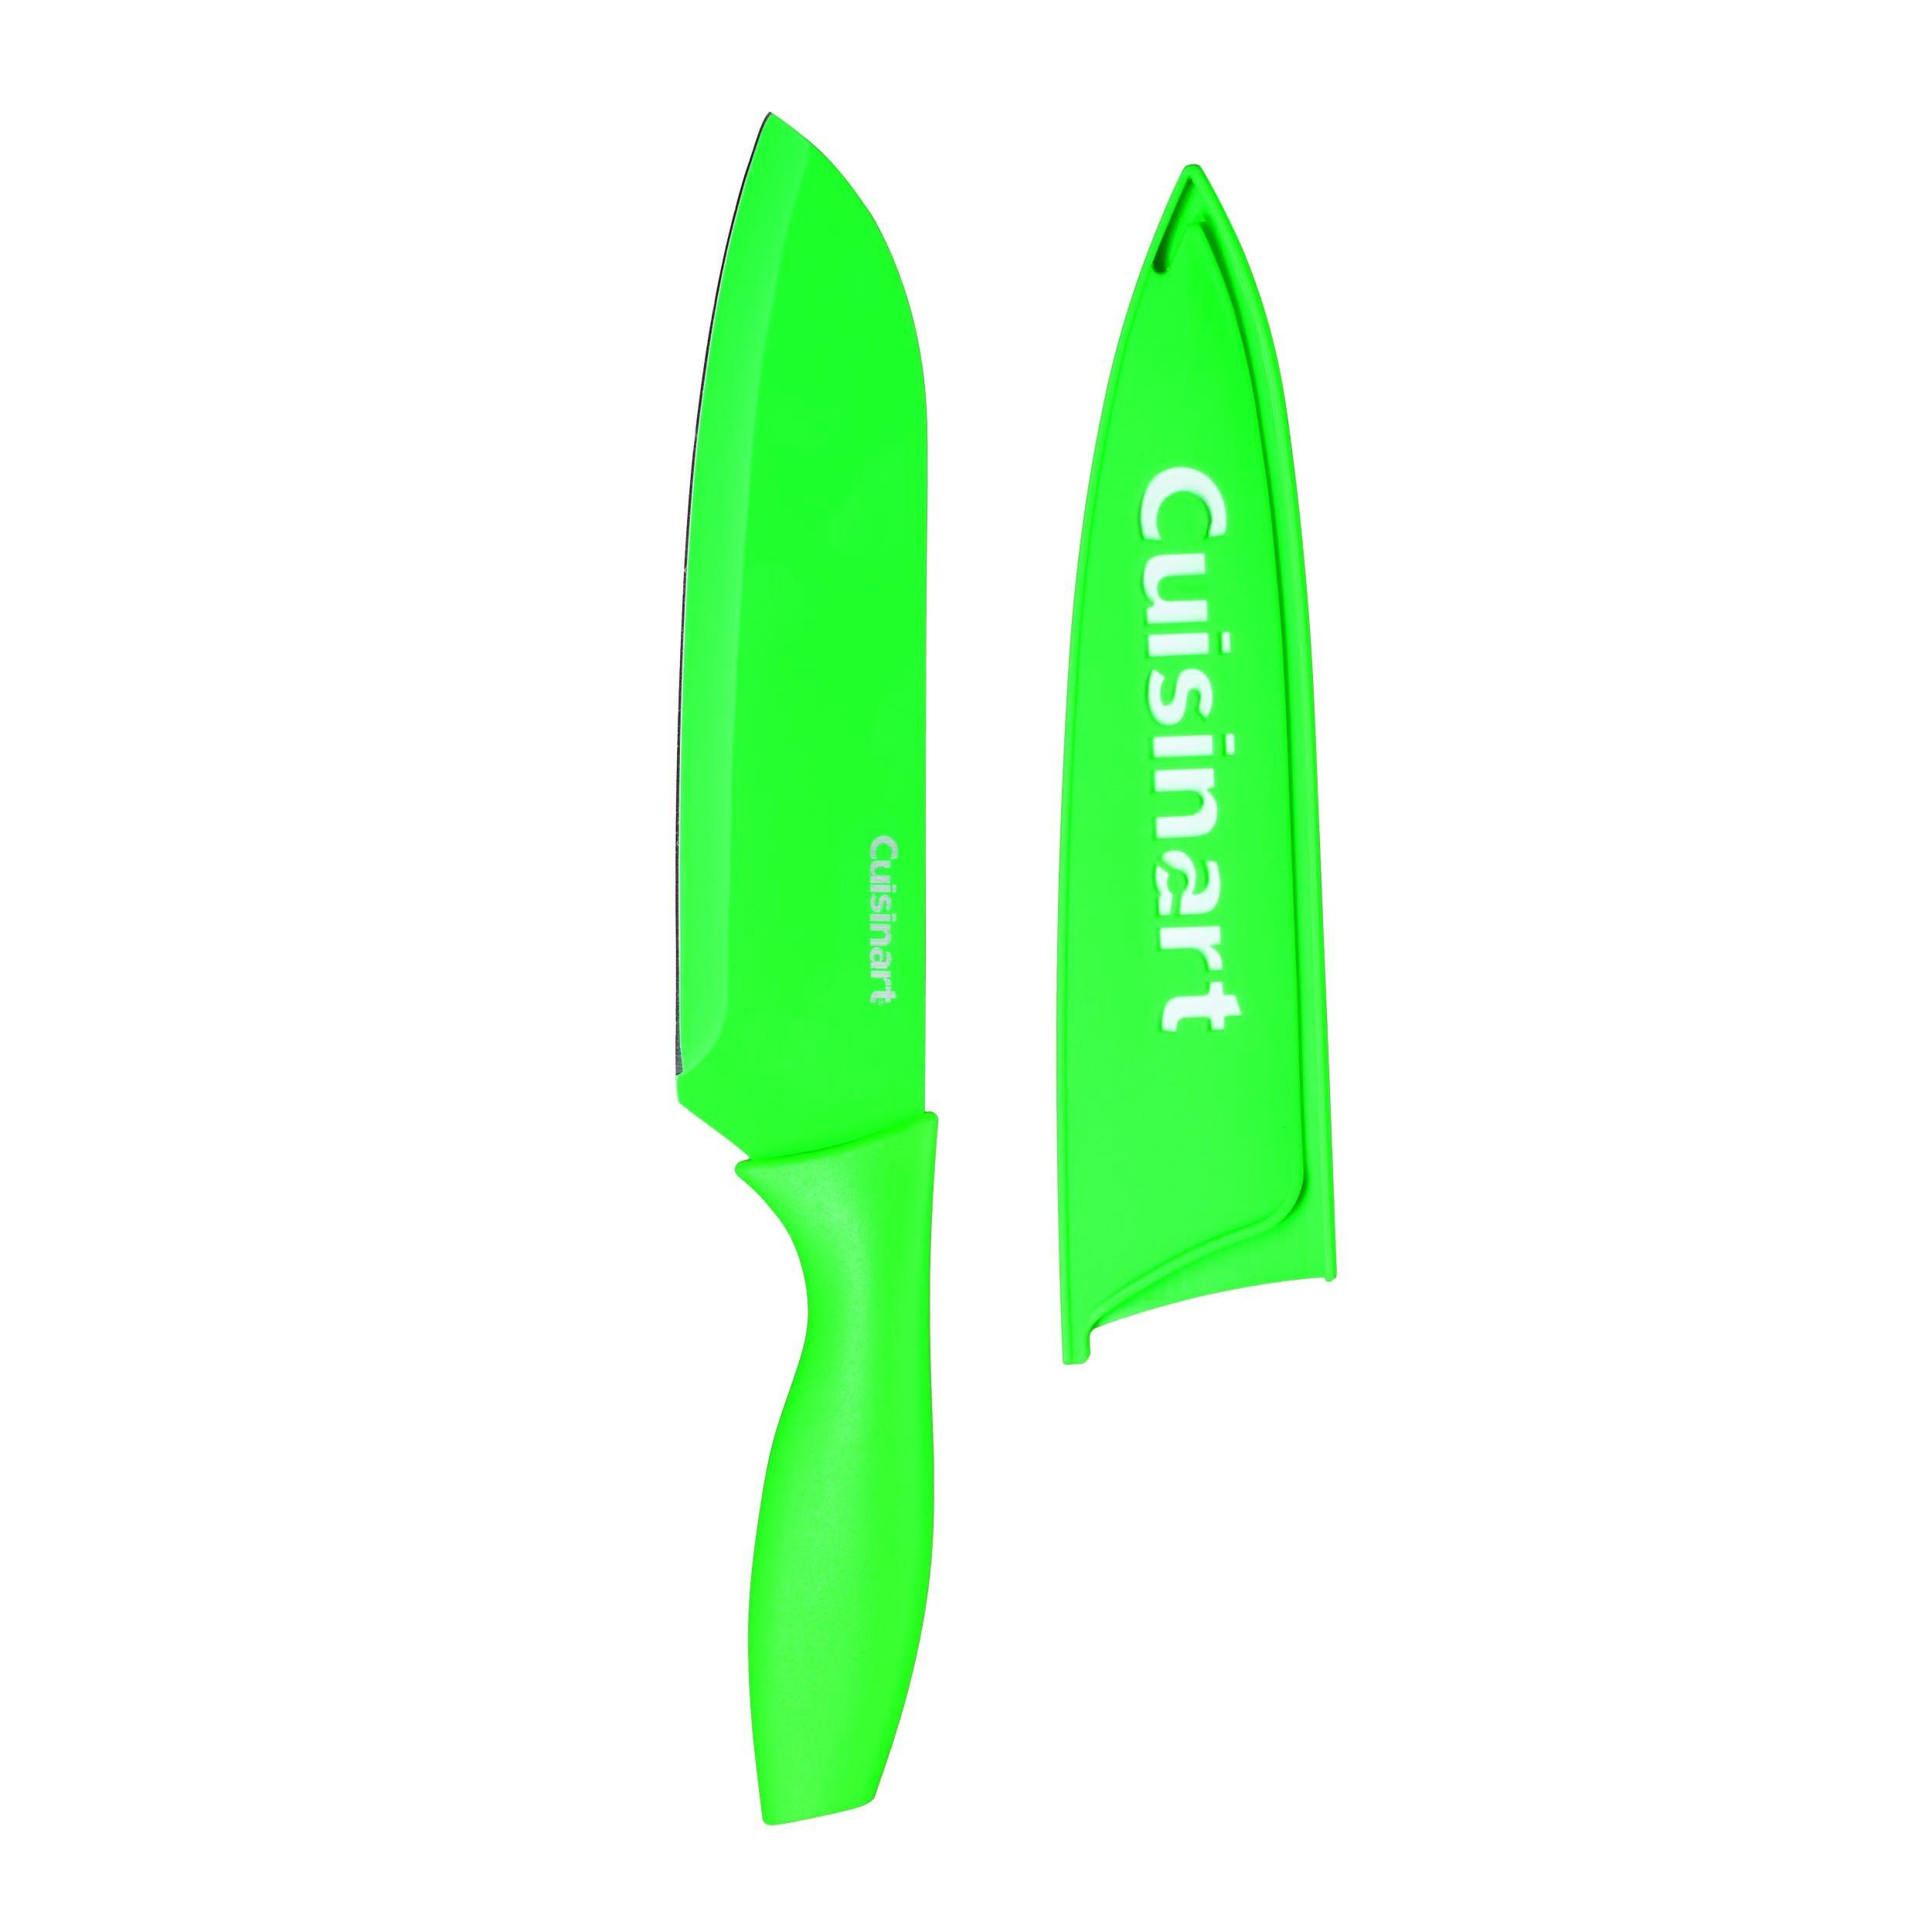 Cuisinart C55CNS-7SANG Advantage Color Collection 7'' Santoku Knife, Green